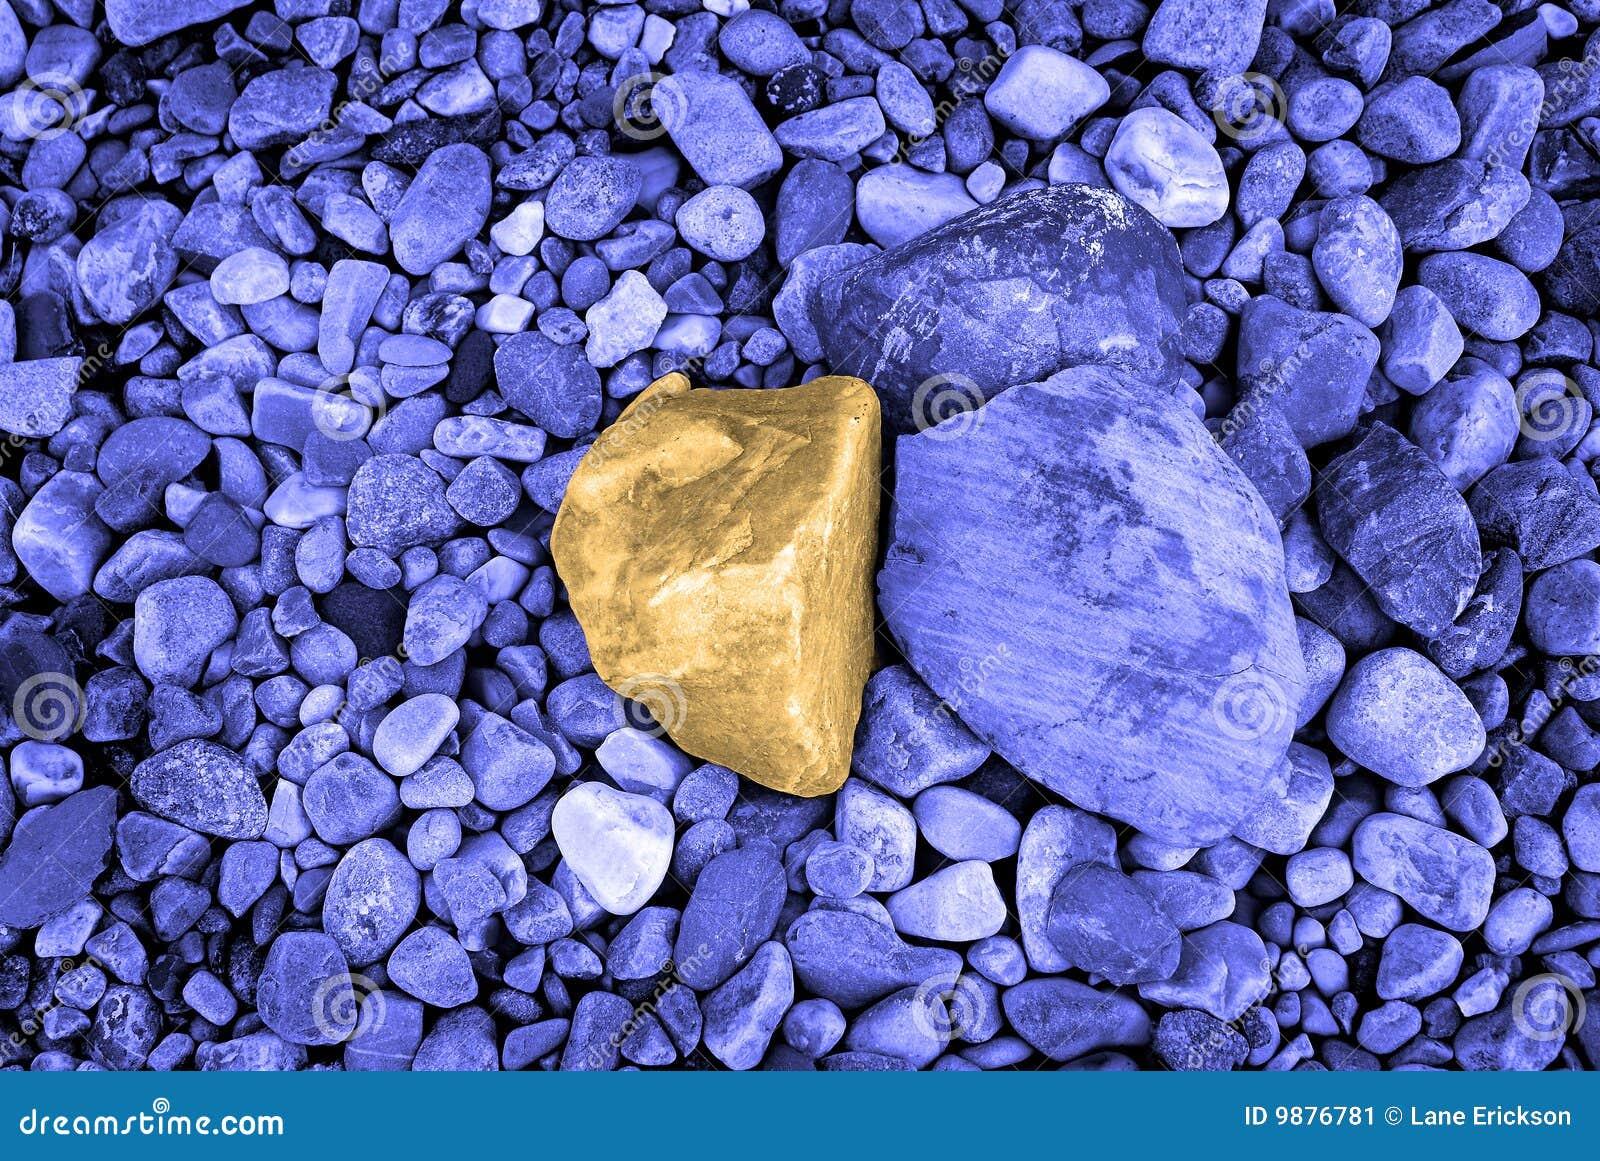 Decorative rocks stock image image 9876781 for Small decorative rocks